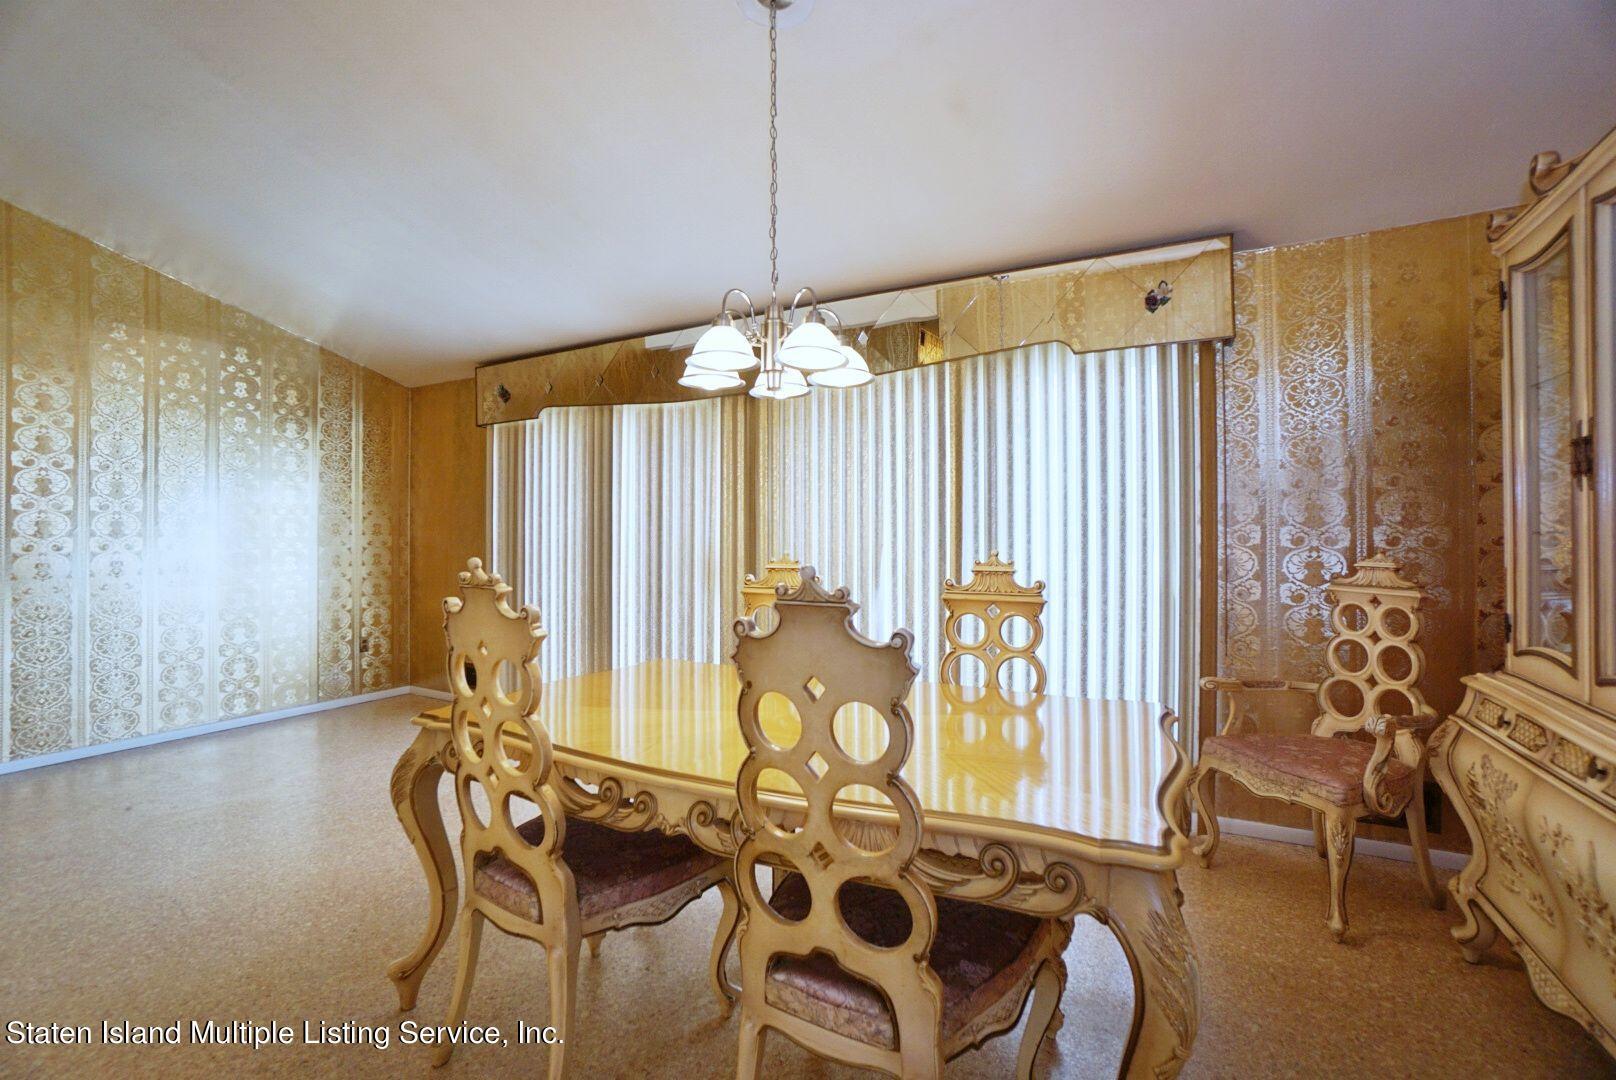 Single Family - Detached 94 Cranford Avenue  Staten Island, NY 10306, MLS-1146620-17